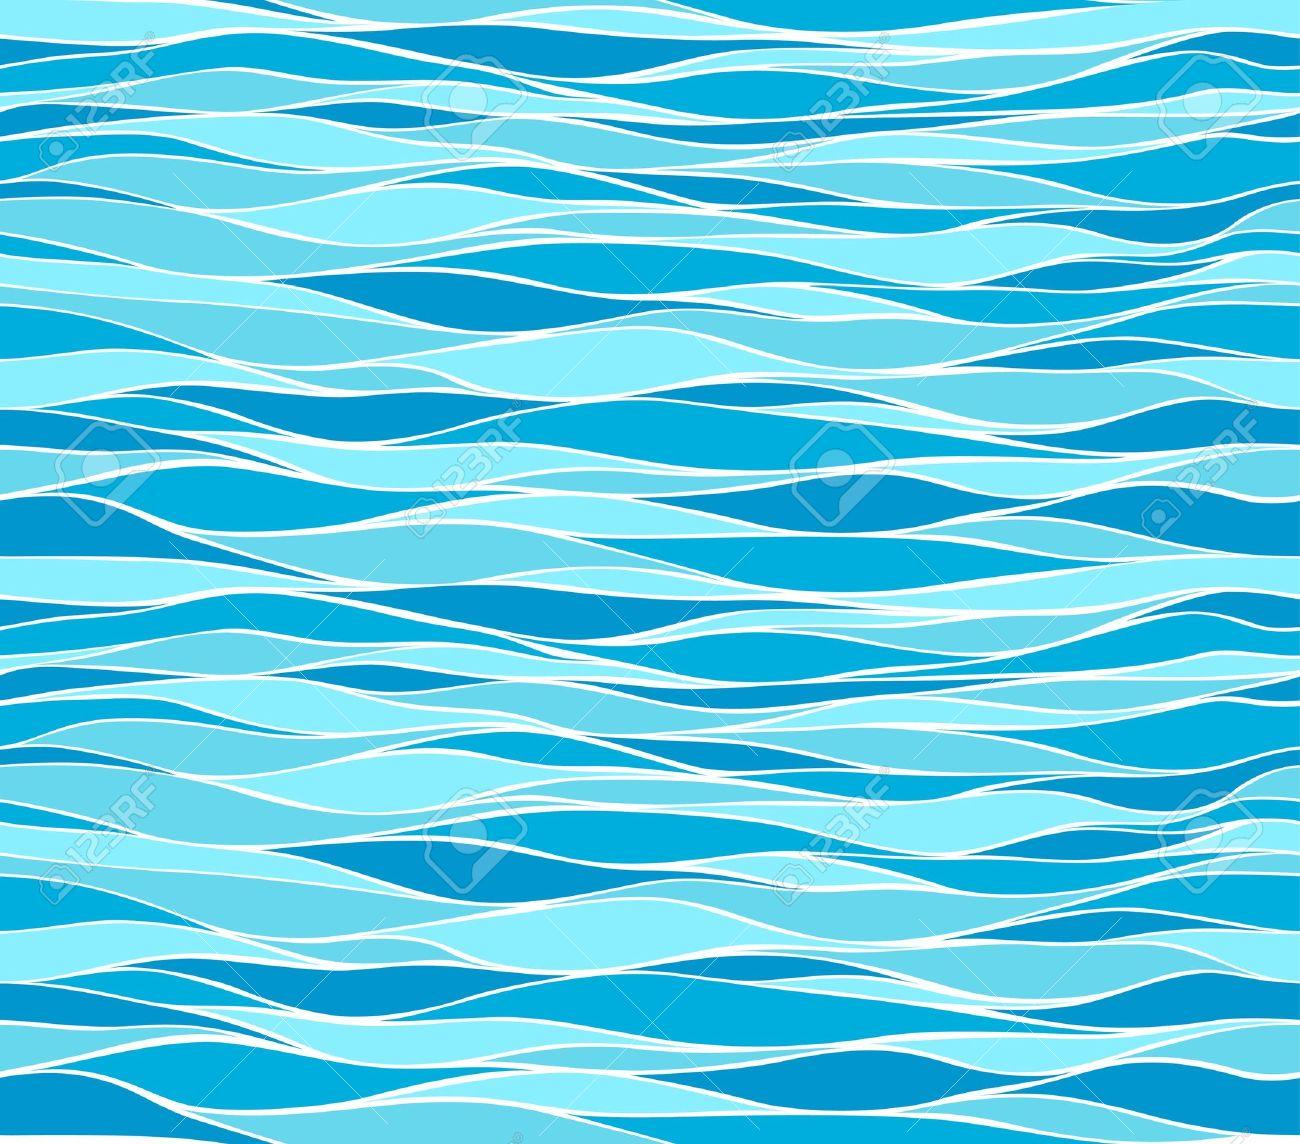 Seamless marine wave patterns - 12789029